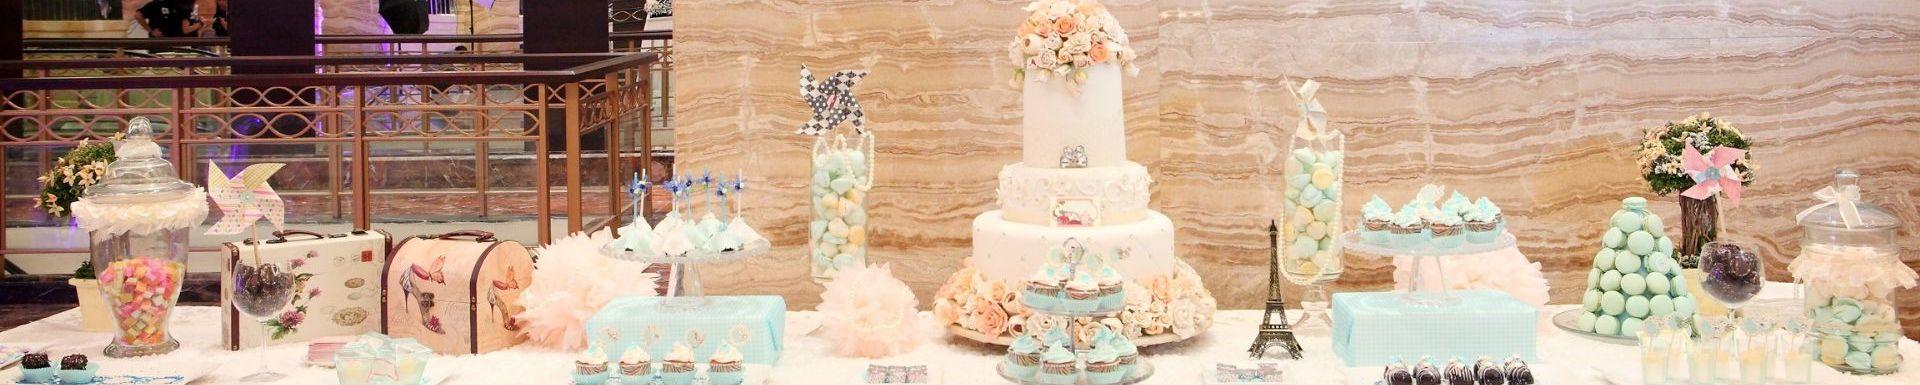 Elly's Cake Art Boutique